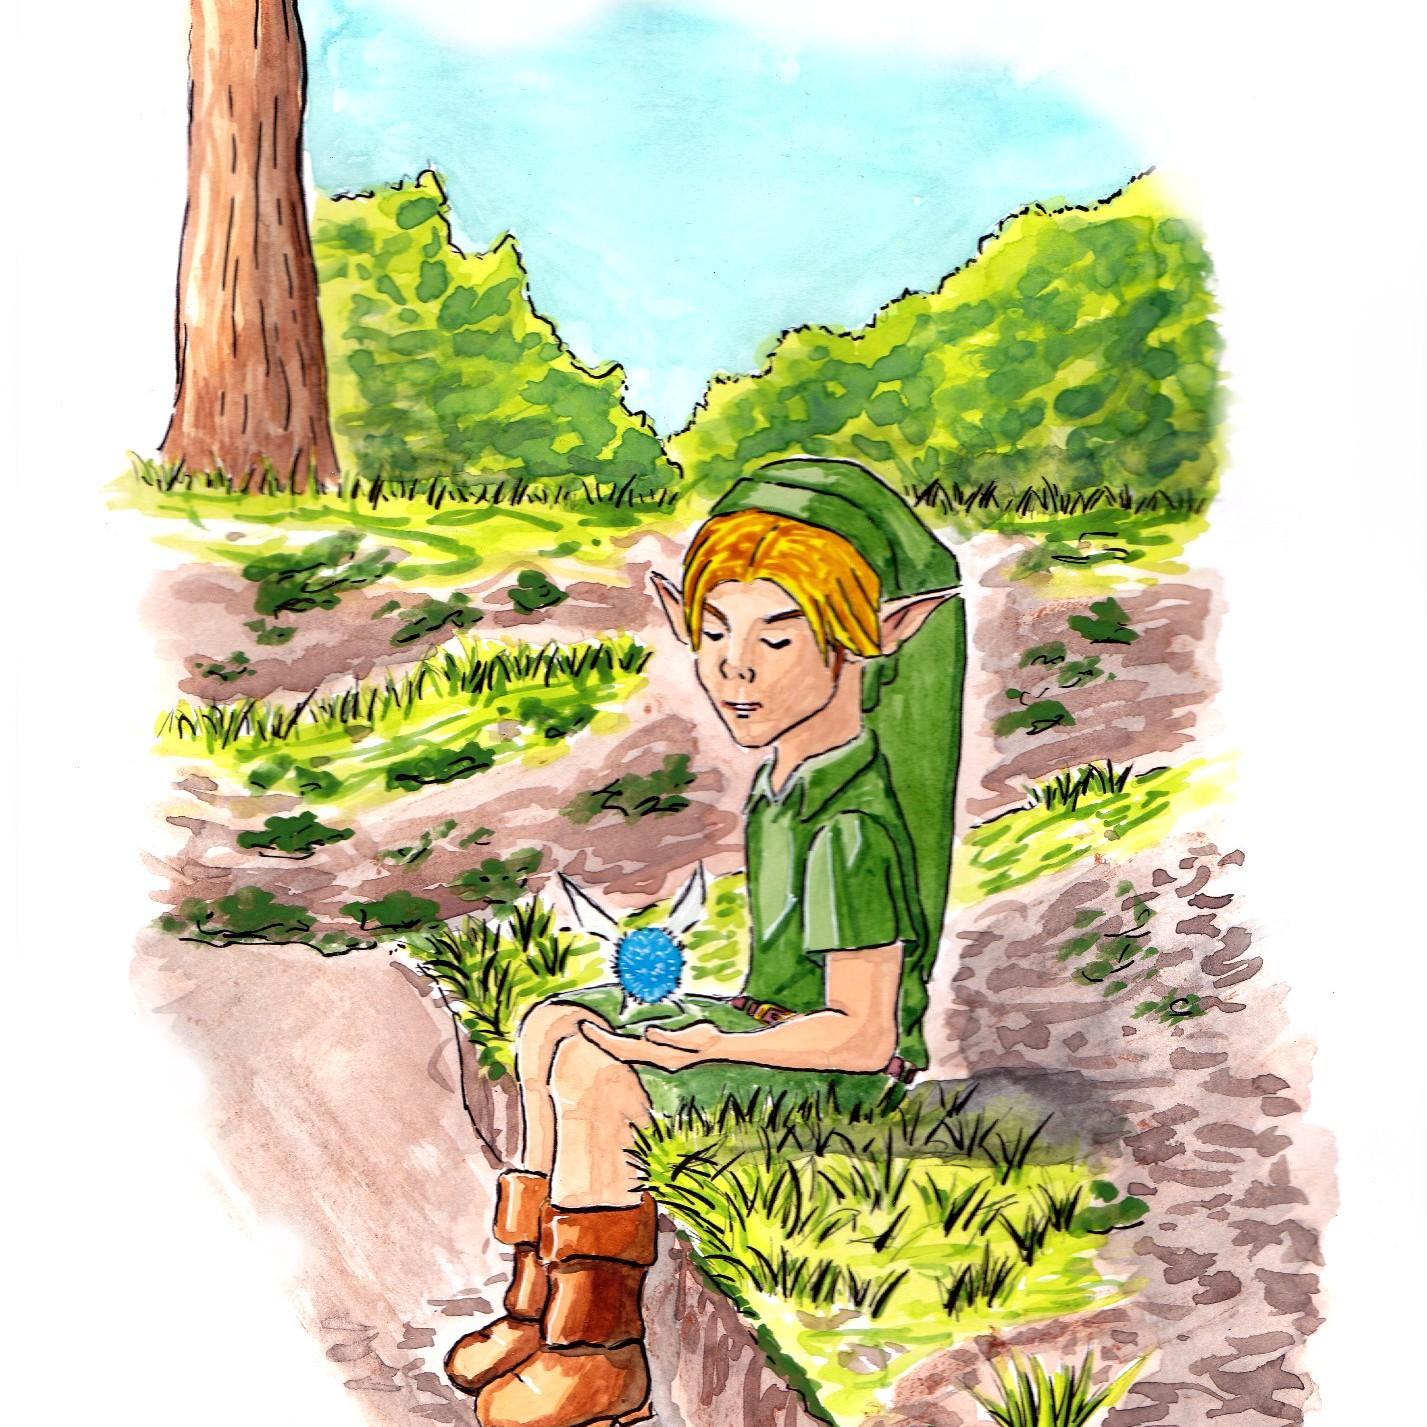 link - legend of zelda -navi - fairy - kokiri - drawing - illustration - retro - games